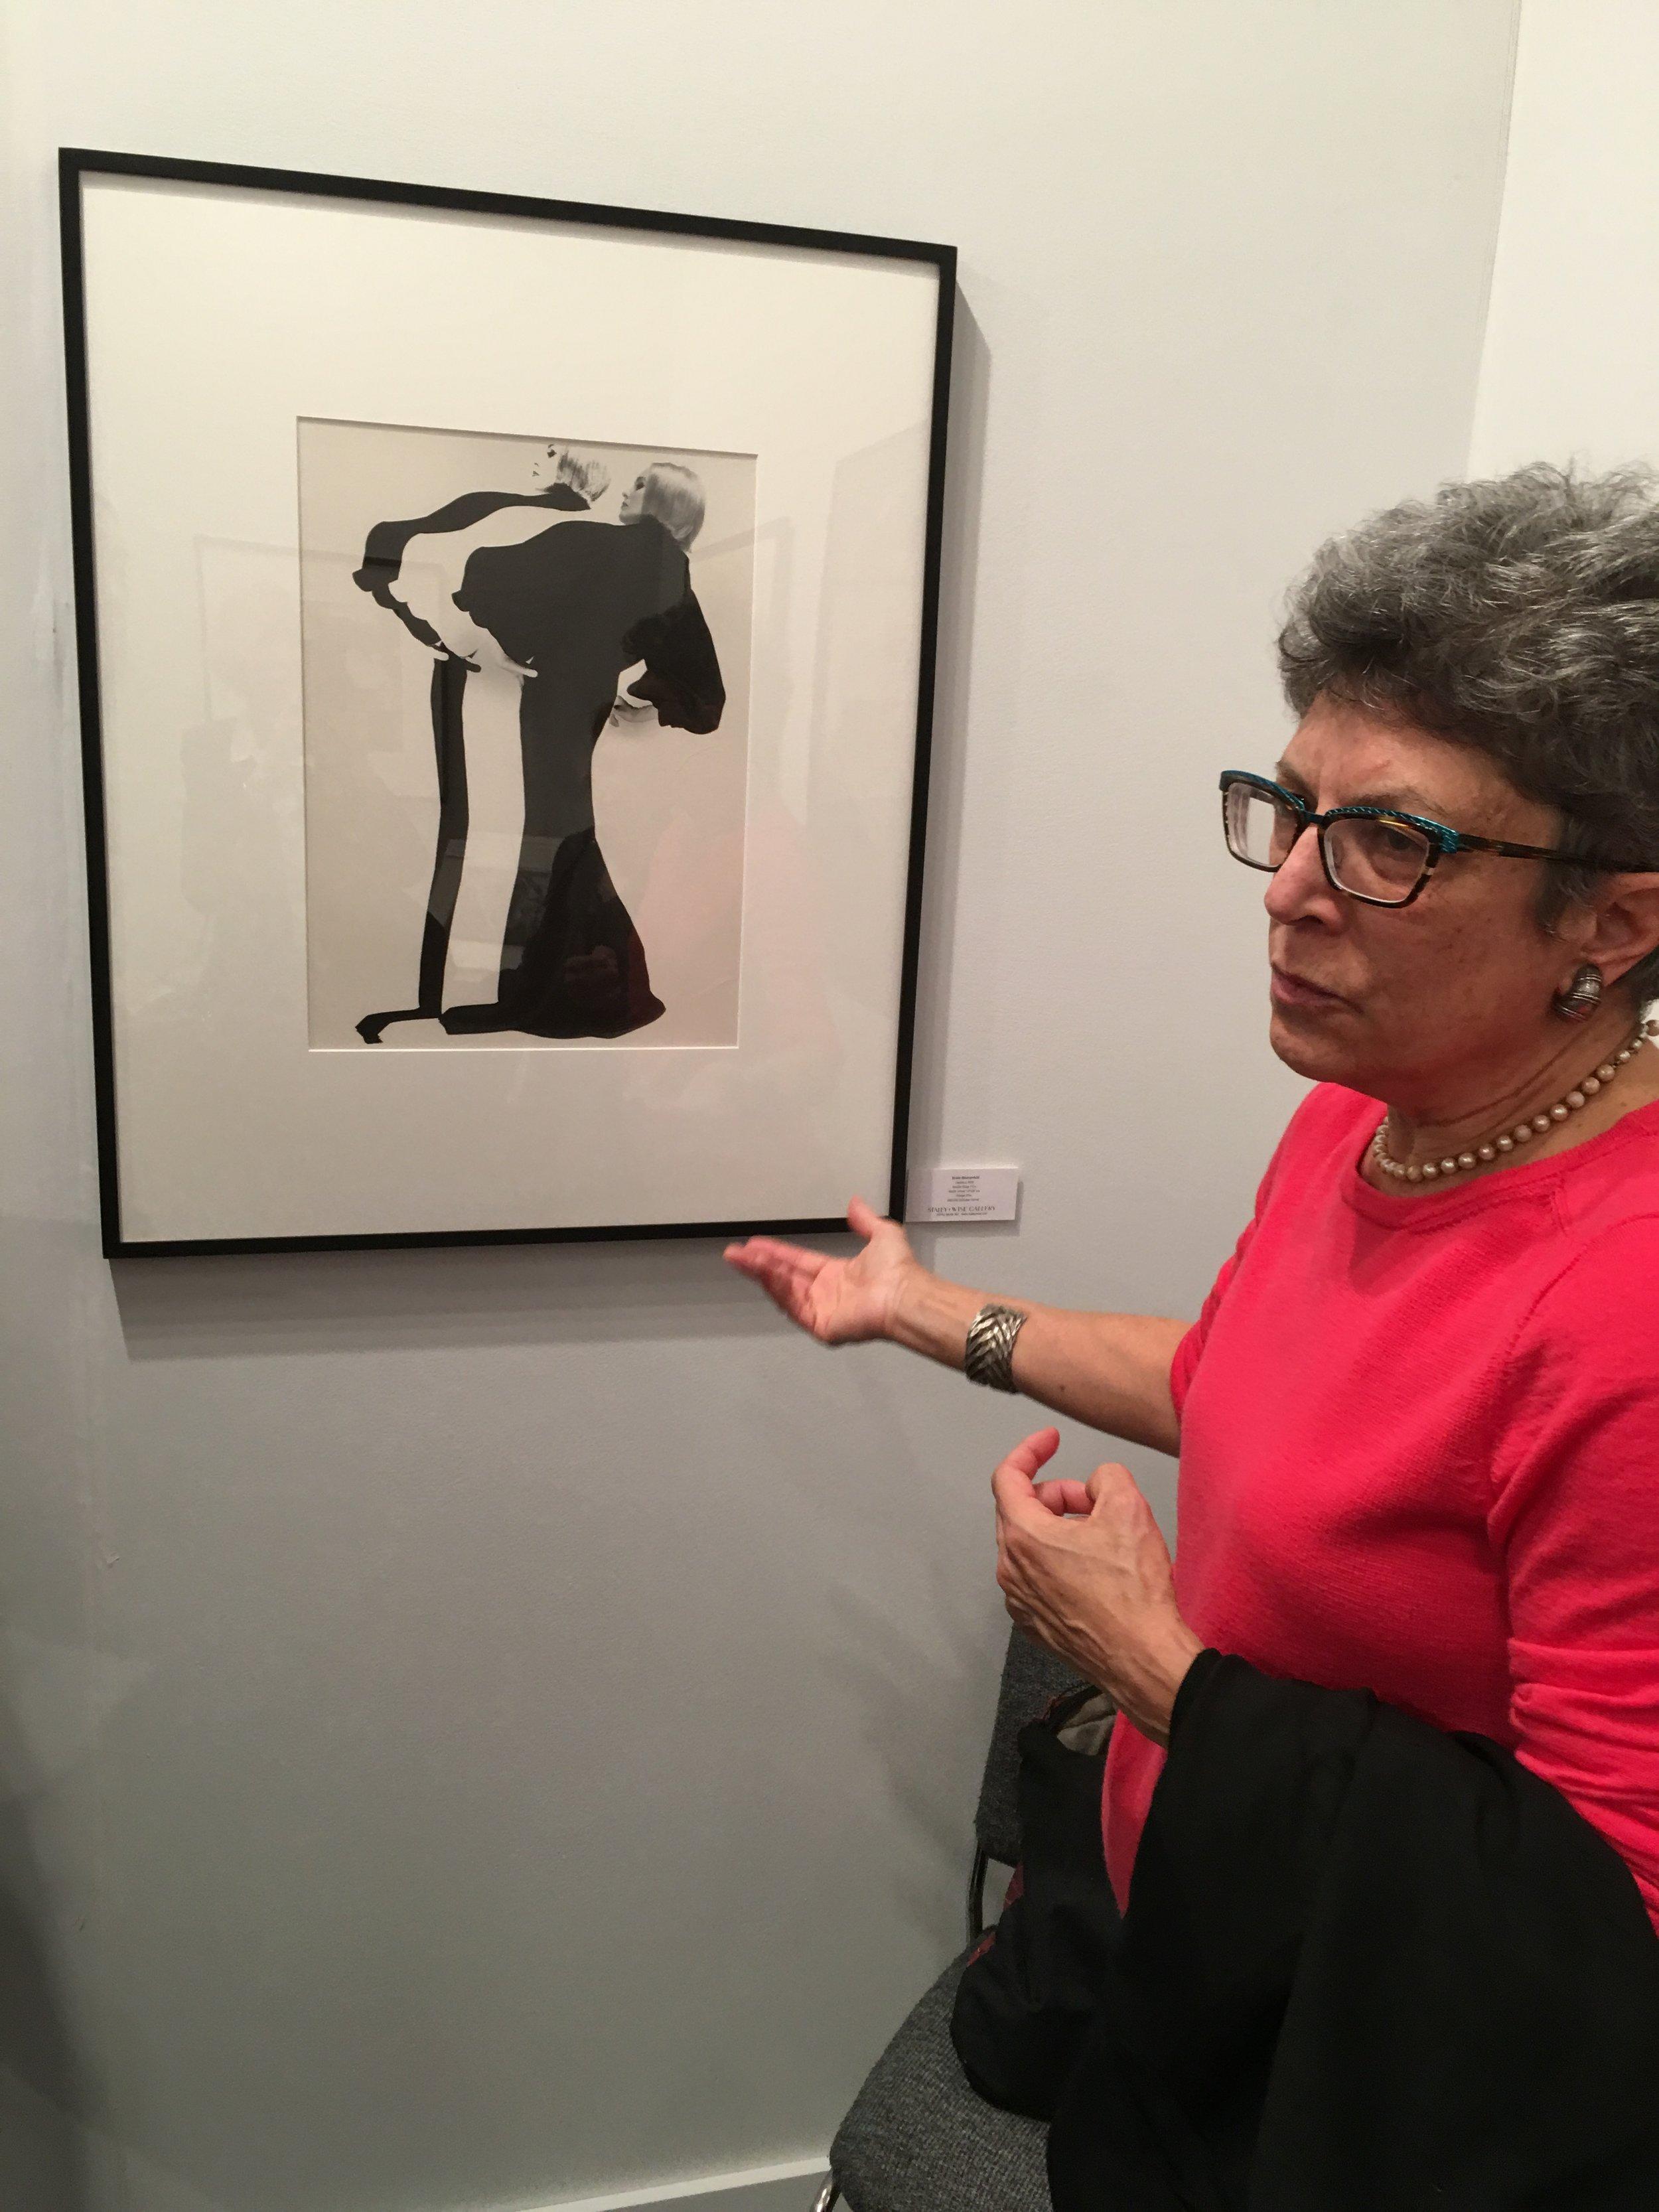 Mary Panzer, O'Toole-Ewald Art Associates Inc's Photography Expert